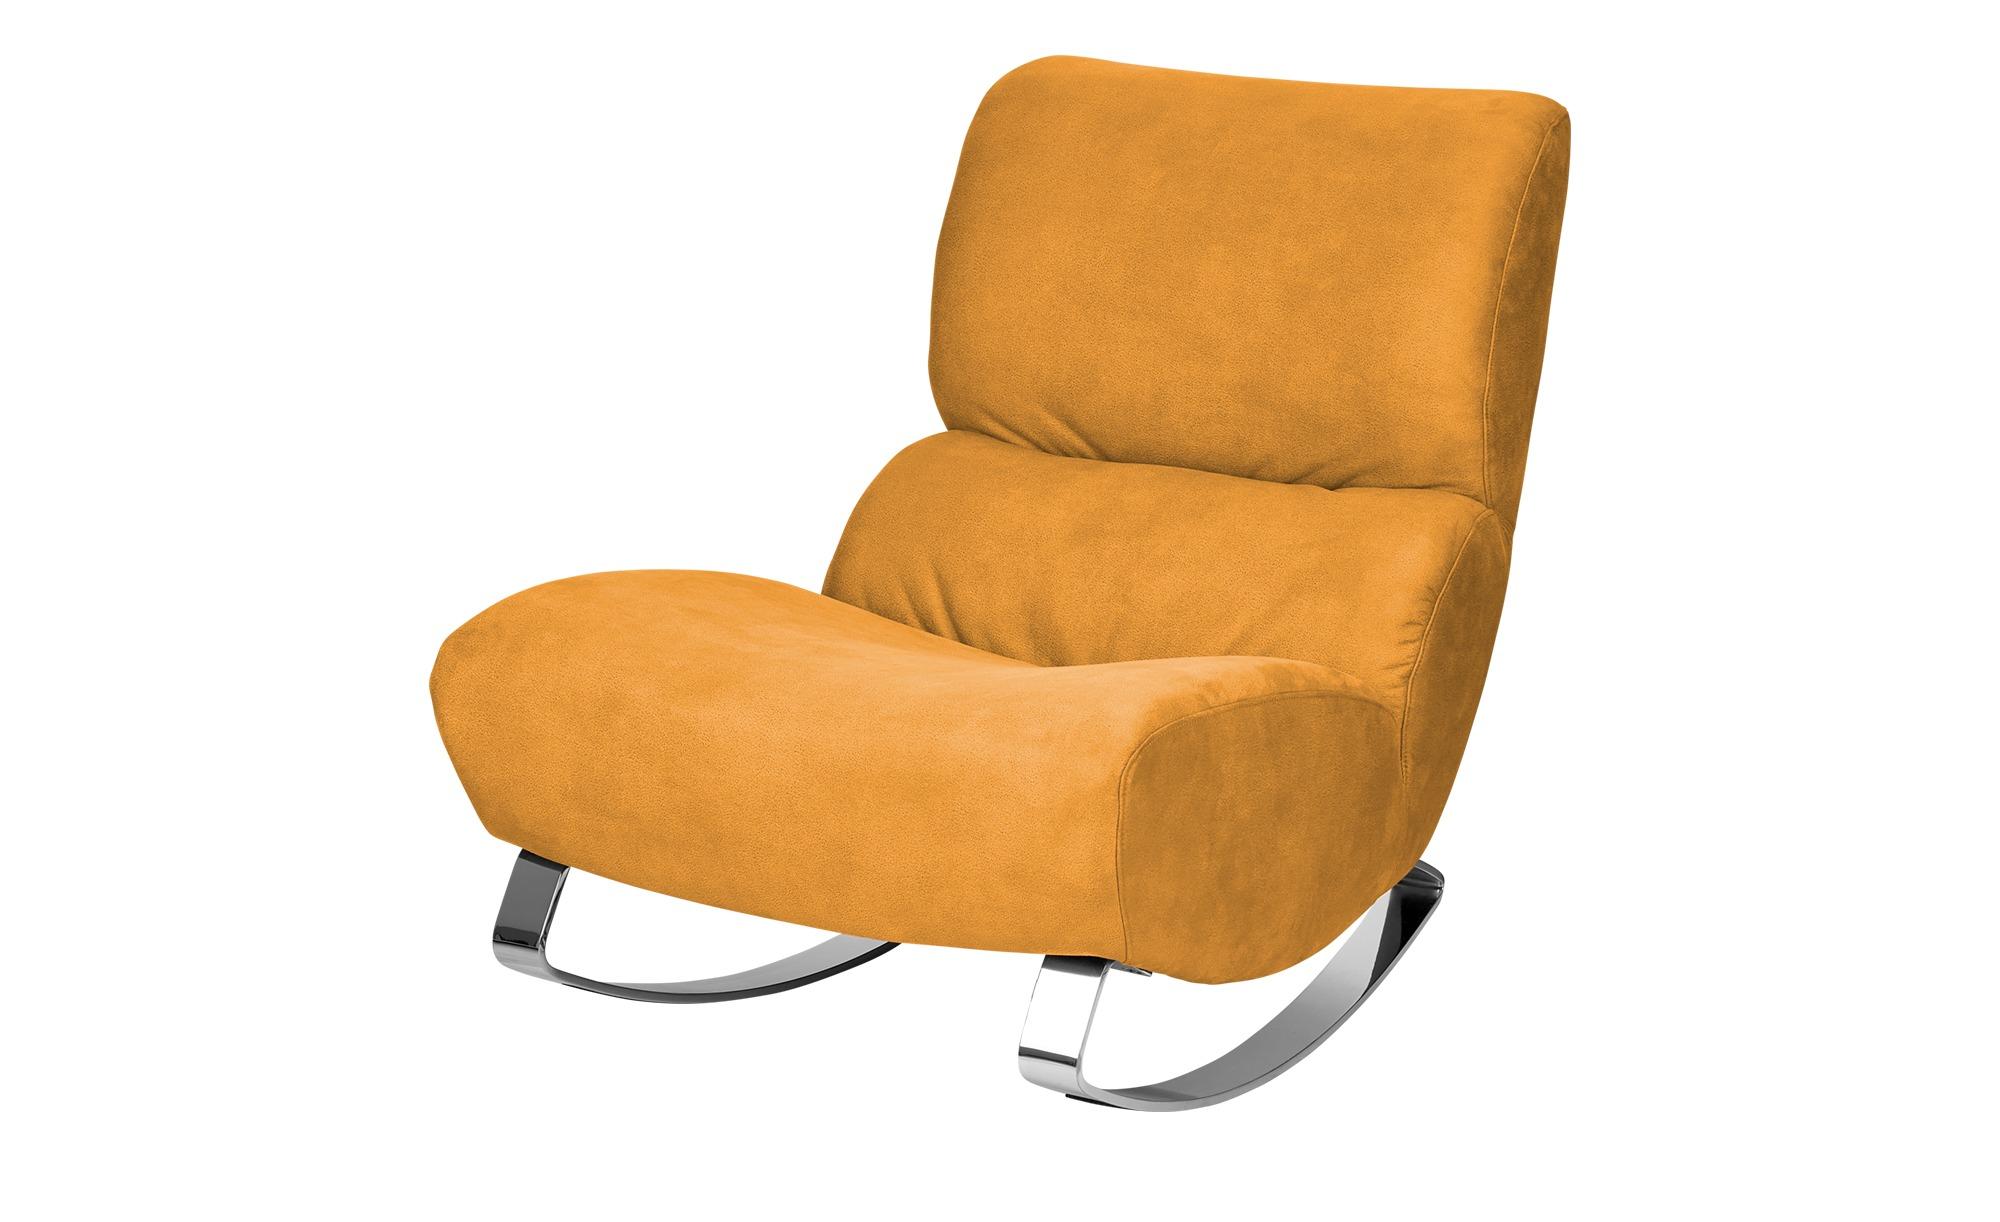 Design-Sessel gelb - Stoff Citole ¦ gelb ¦ Maße (cm): B: 76 H: 90 T: 103 Polstermöbel > Sessel > Polstersessel - Höffner